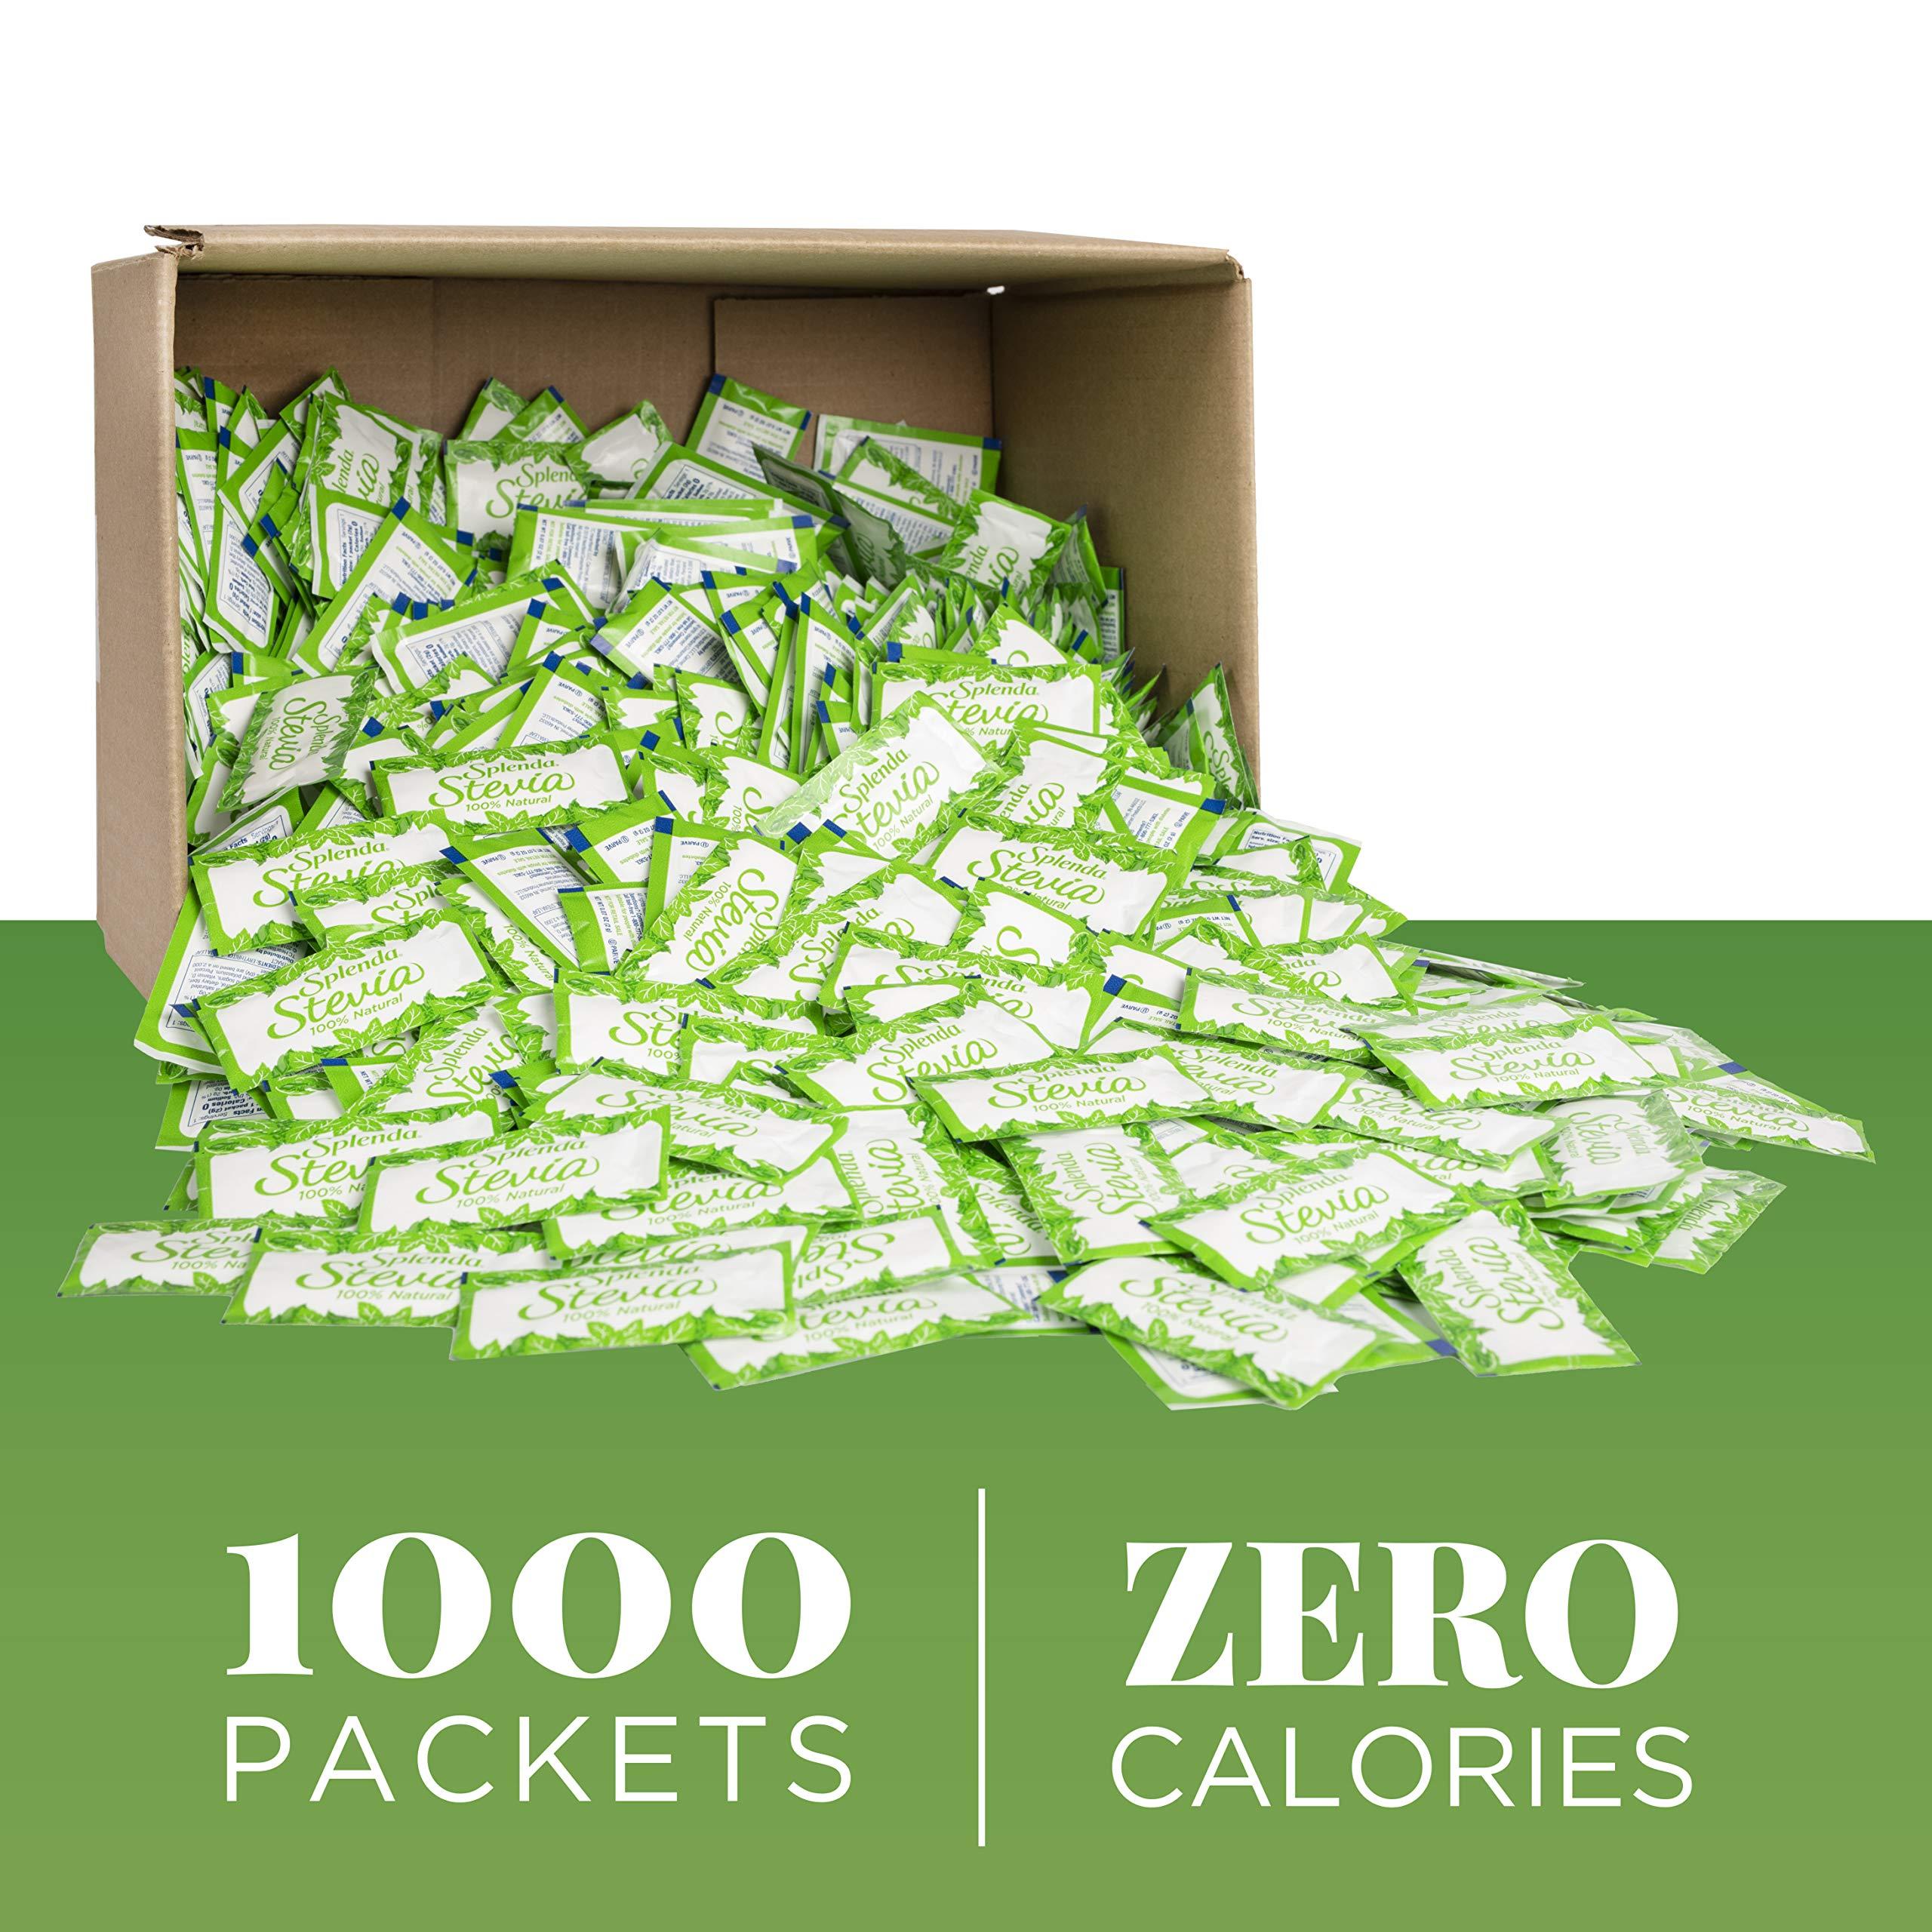 Splenda Naturals Stevia Sweetener: No Calorie, Natural Sugar Substitute w/ No Bitter Aftertaste. Bulk Single-Serve Packets (1000 Count) by Splenda